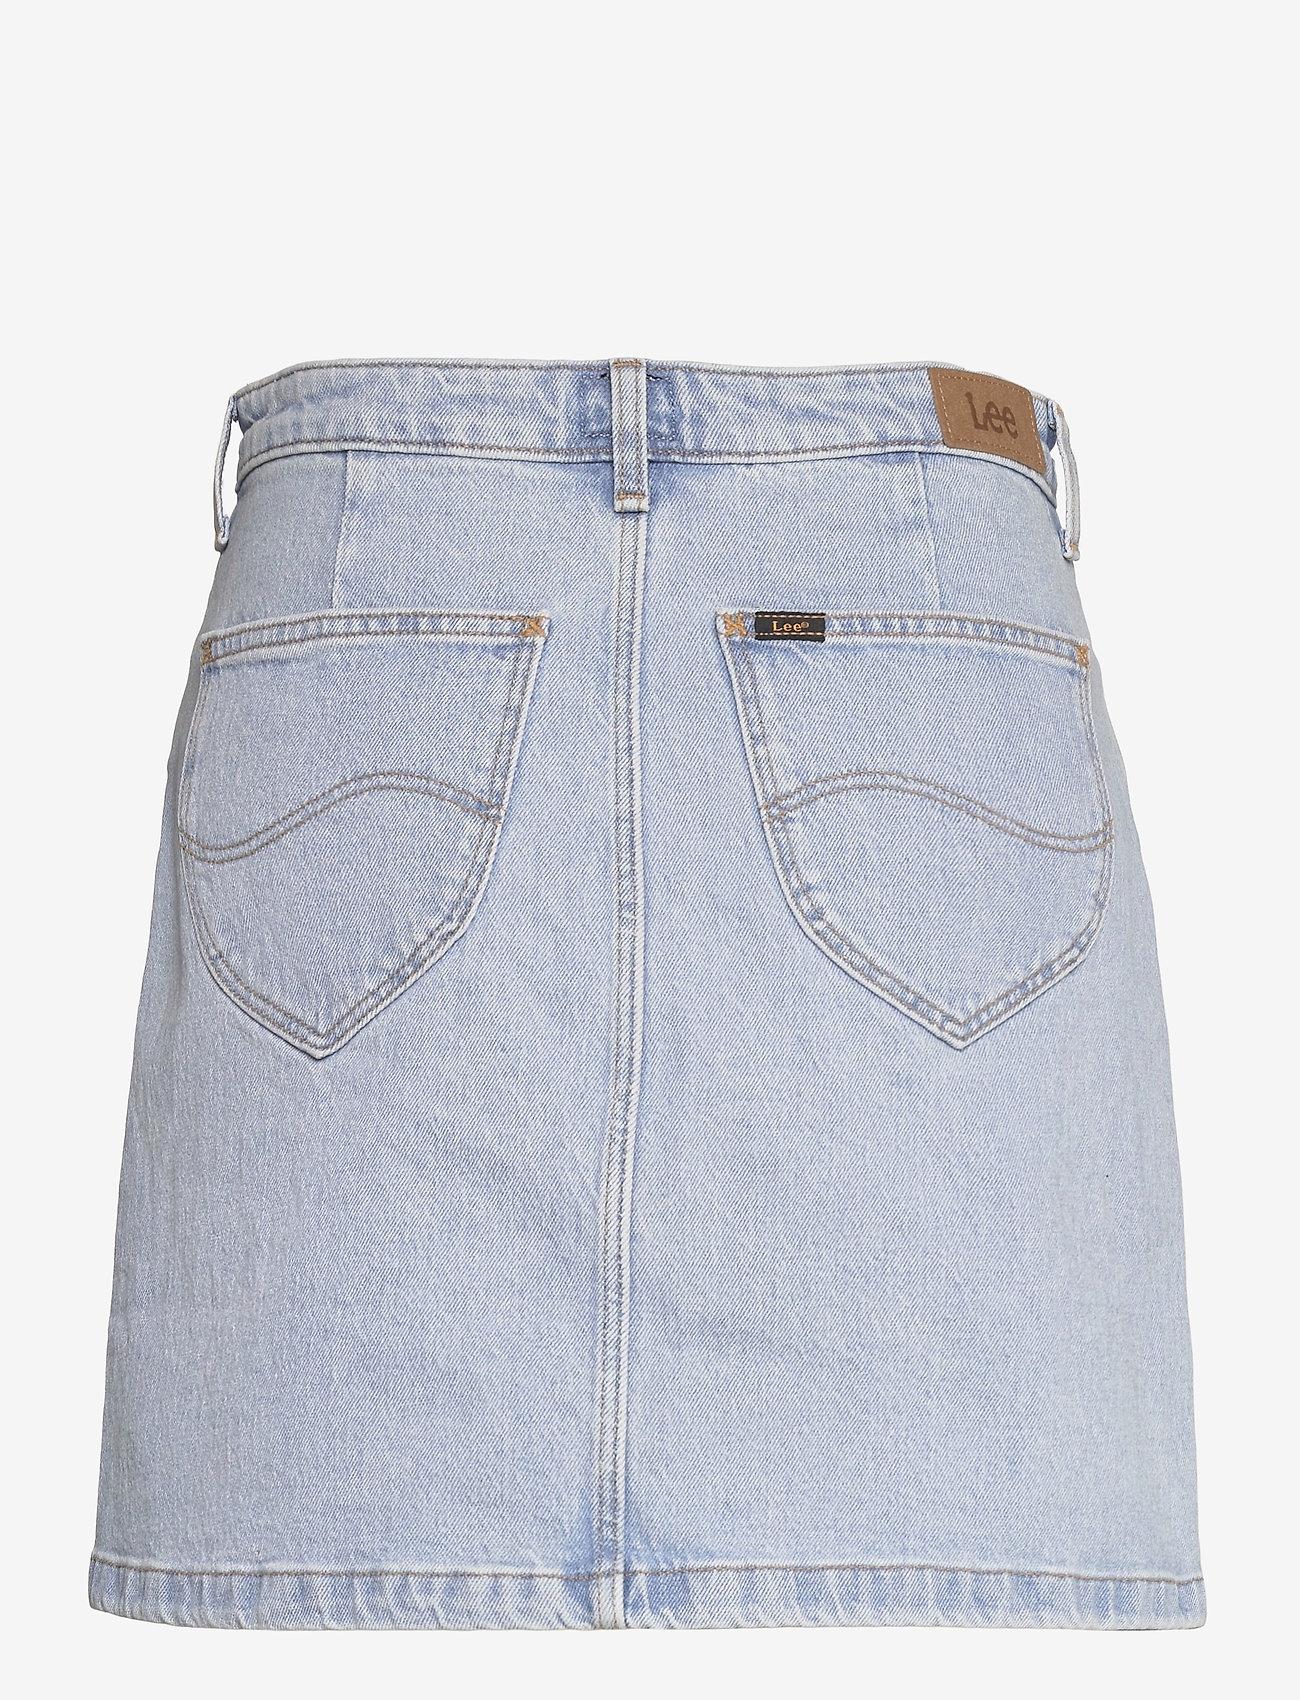 Lee Jeans - BUTTON FLY A LINE SK - jeanskjolar - light alton - 1